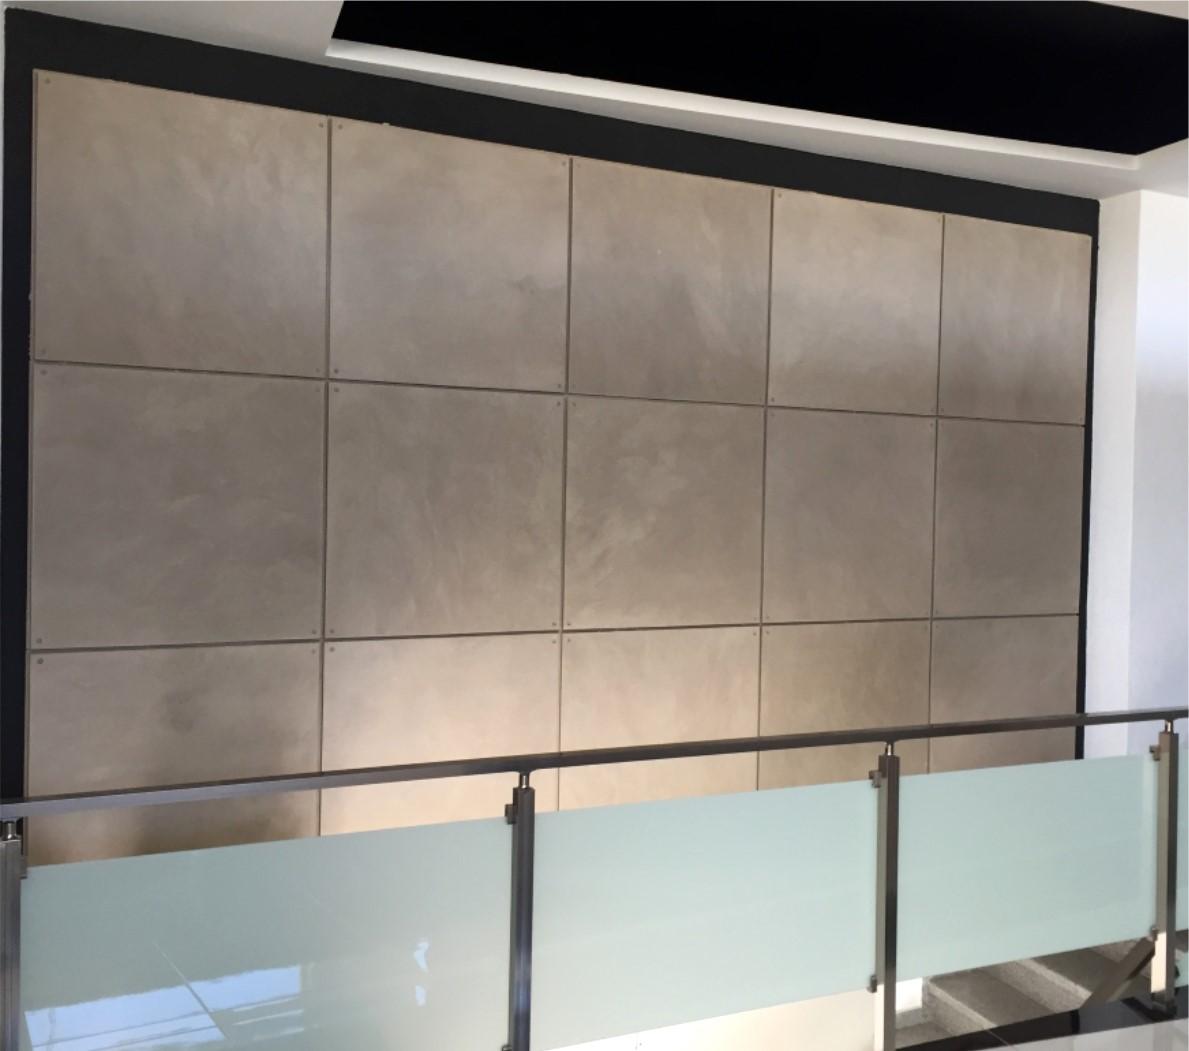 pannelli effetto beton